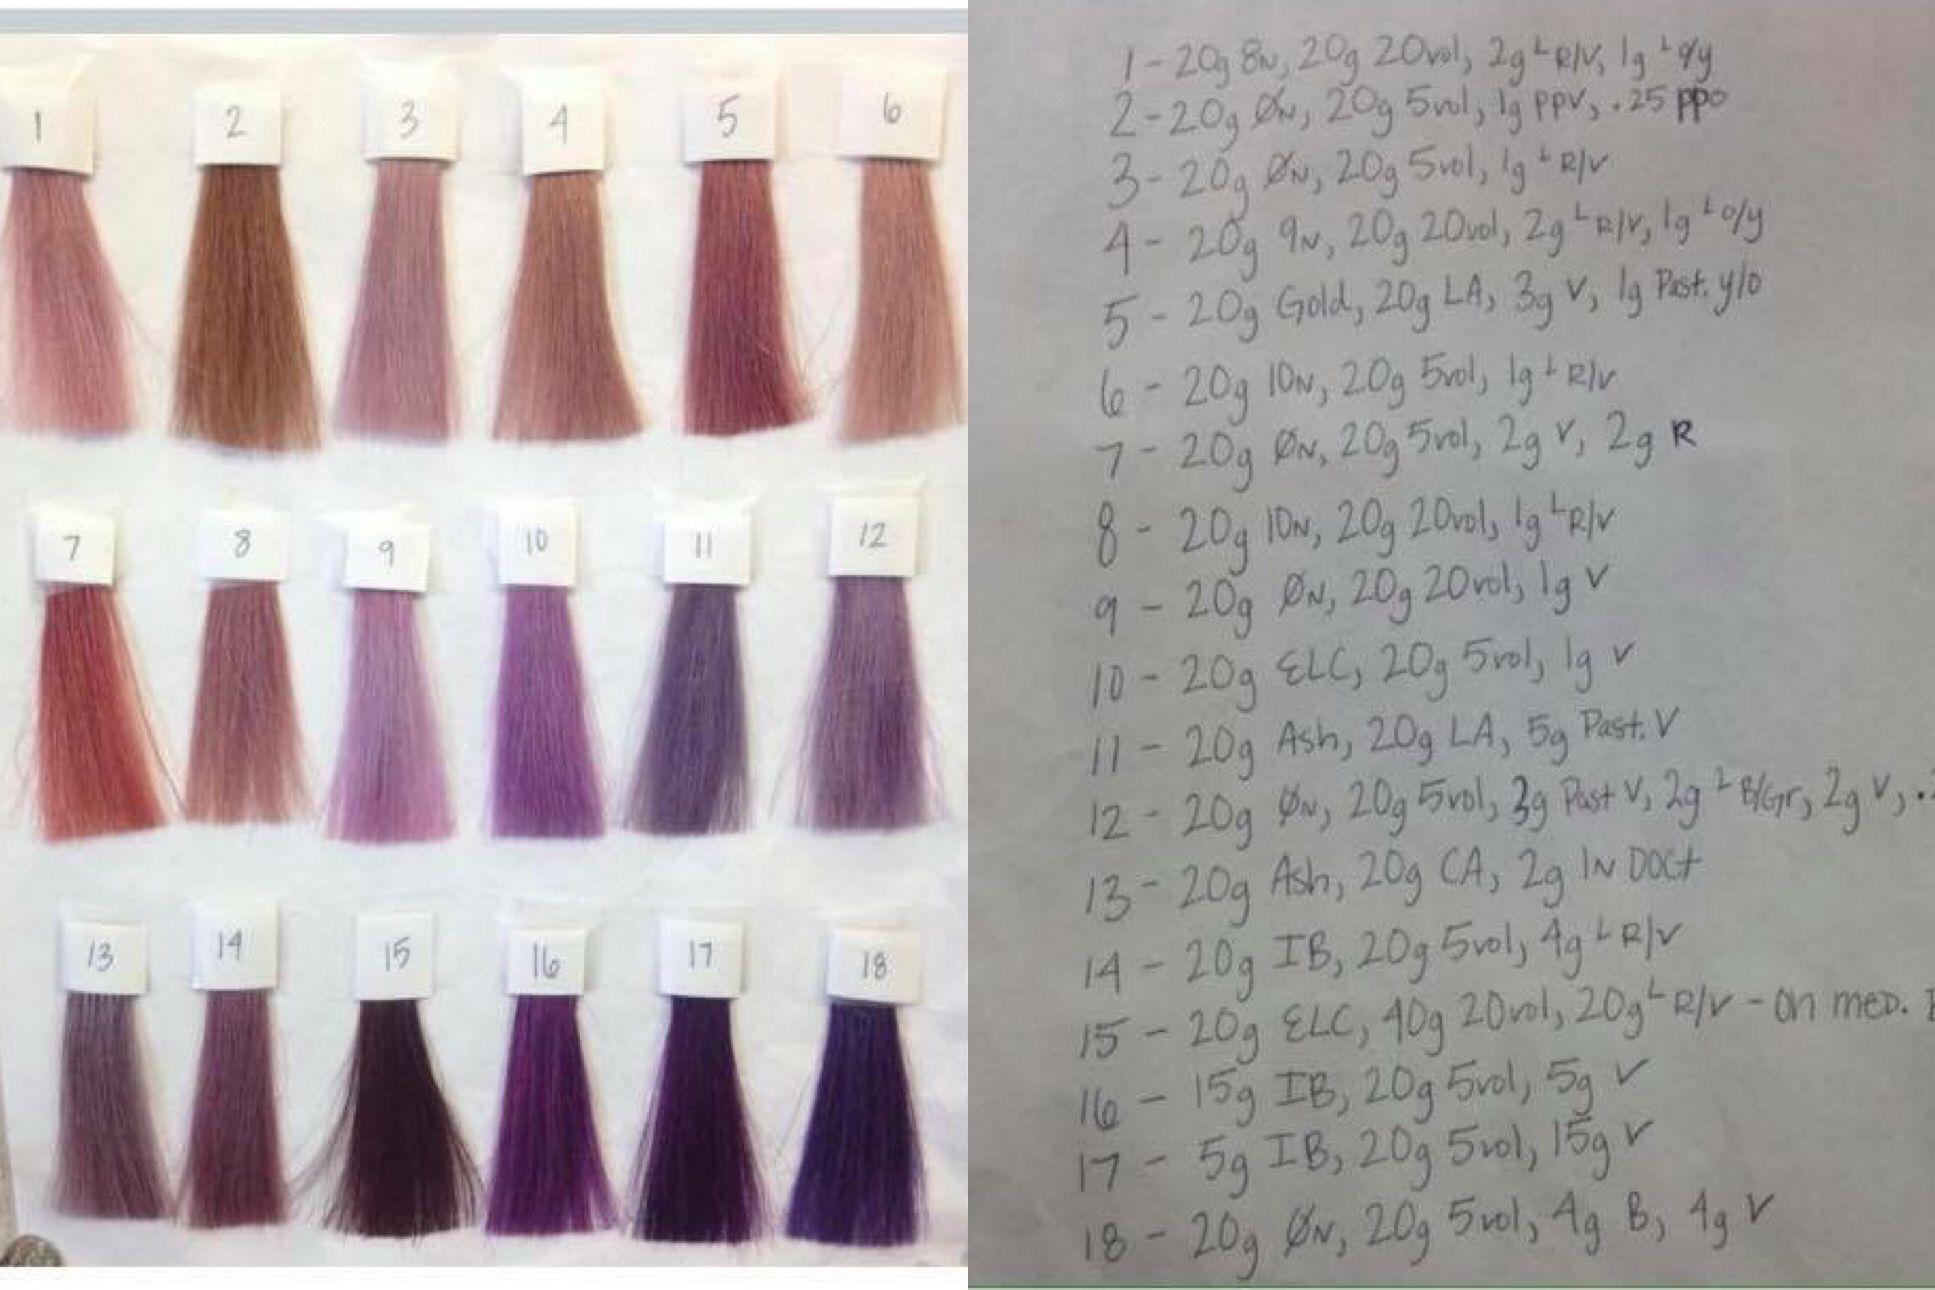 Pin By Aliya Jonic On Aveda Aveda Hair Color Aveda Color Hair Color Chart